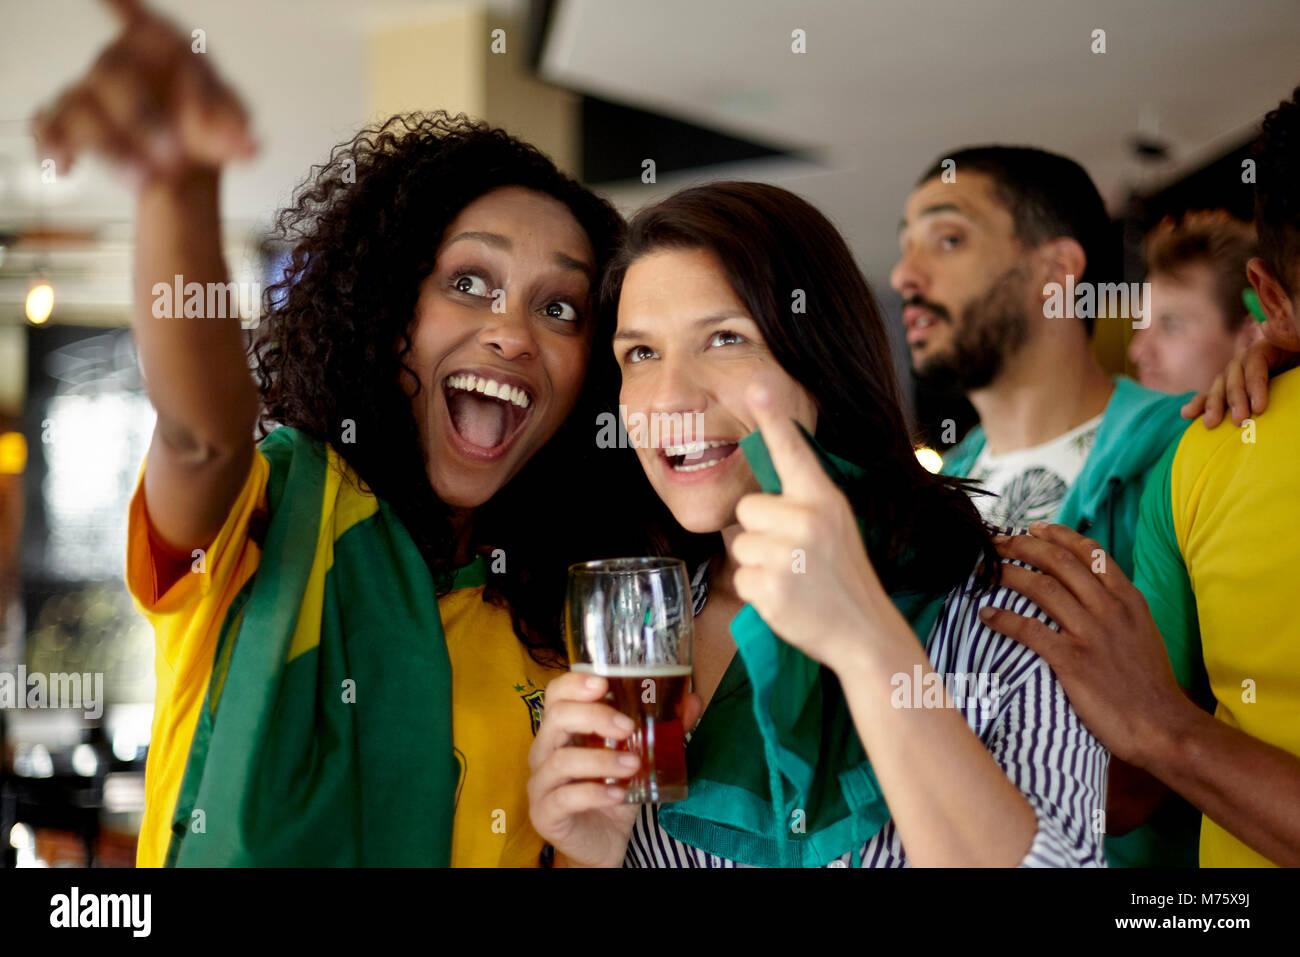 Brasilianische Fußballfans beobachten Match in bar Stockbild